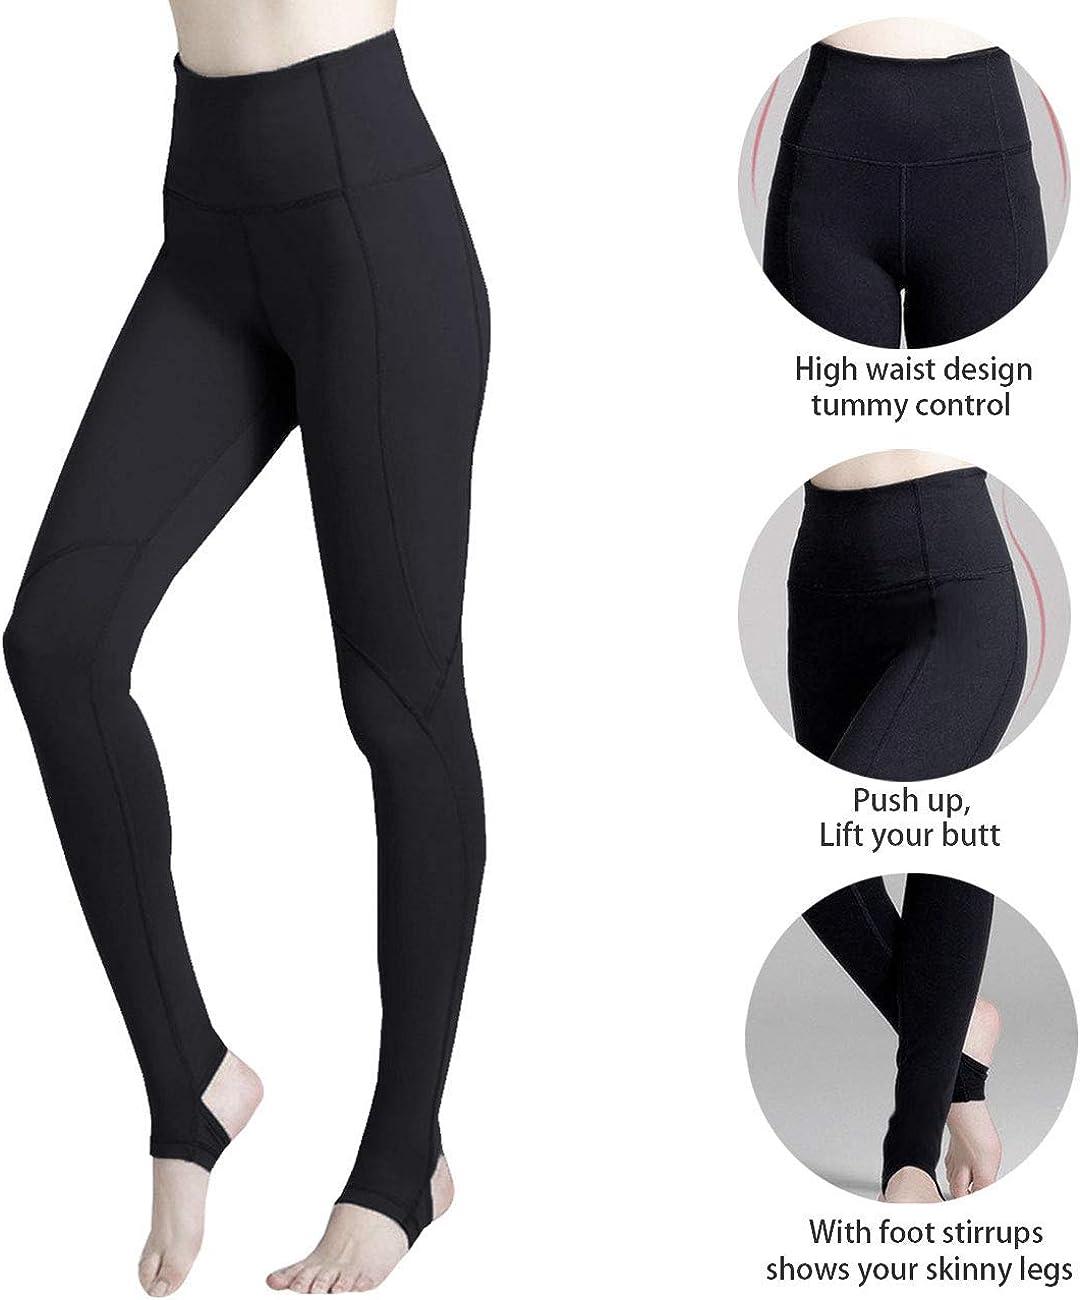 Ecupper Womens Yoga Pants Stirrup Tights High Waist Stretch Sports Workout Leggings